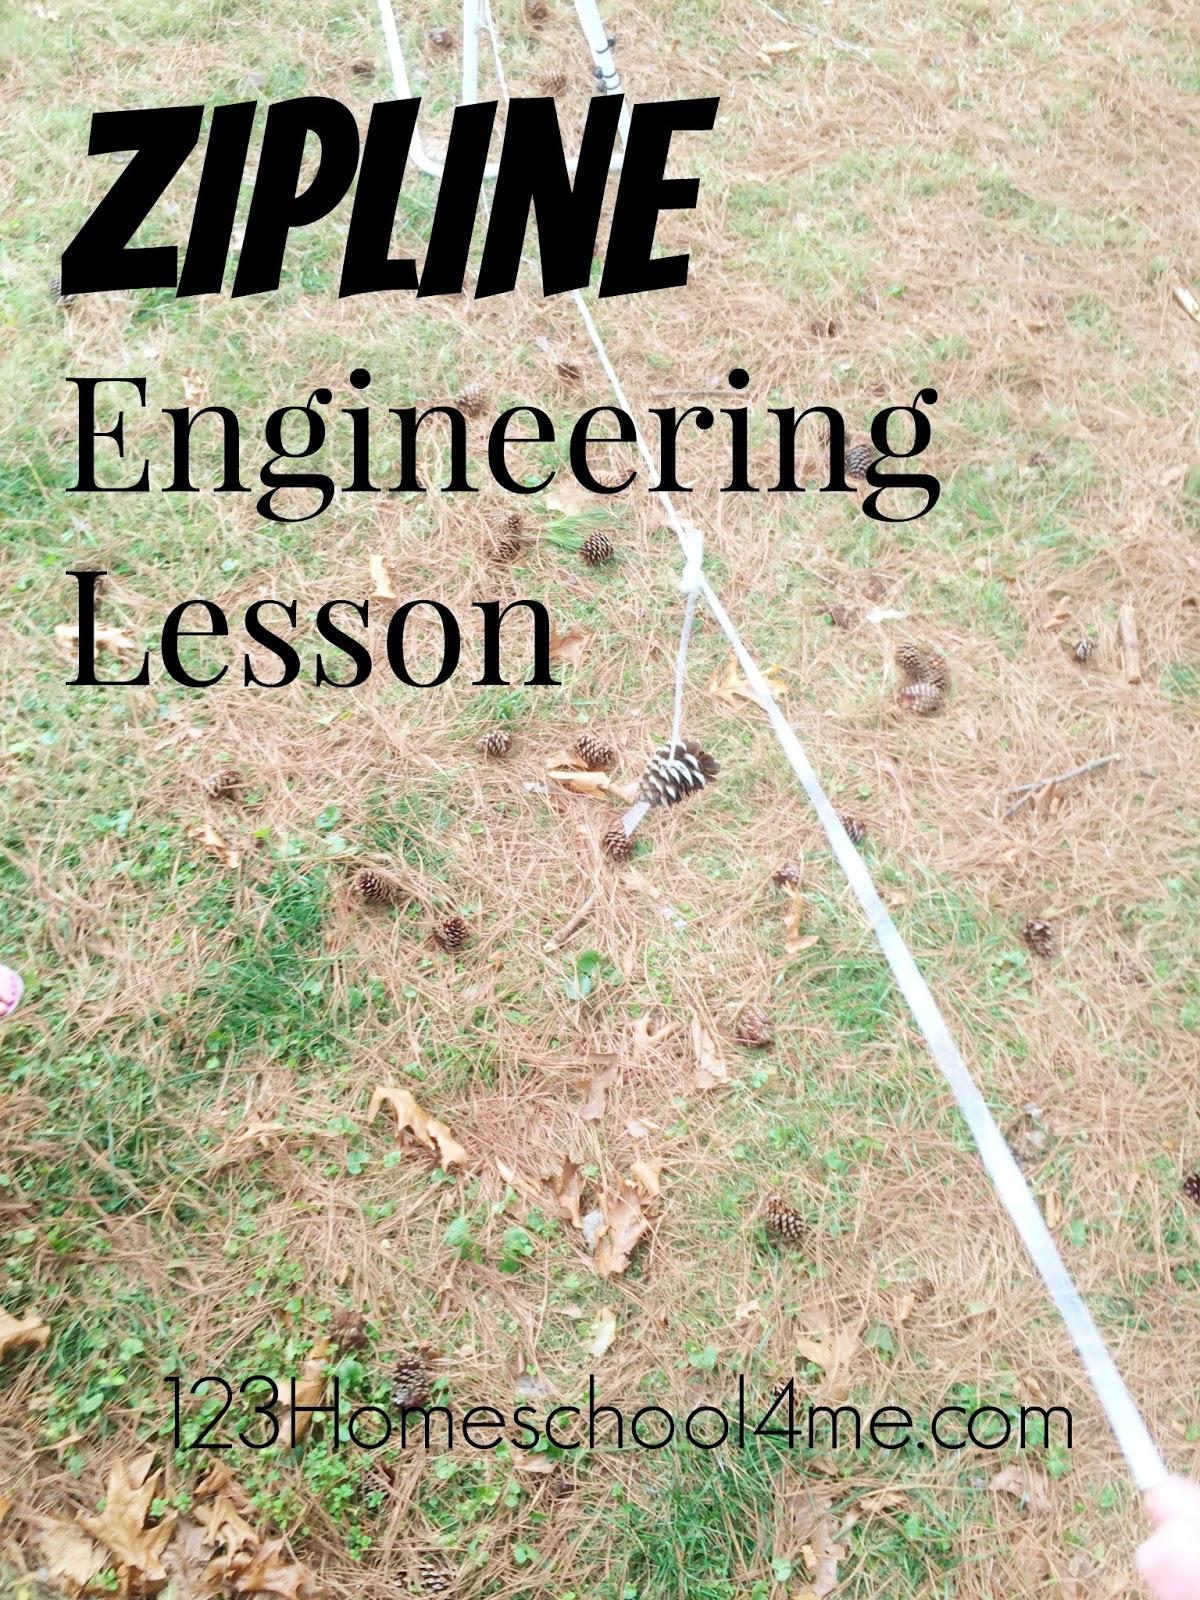 zipline engineering lesson